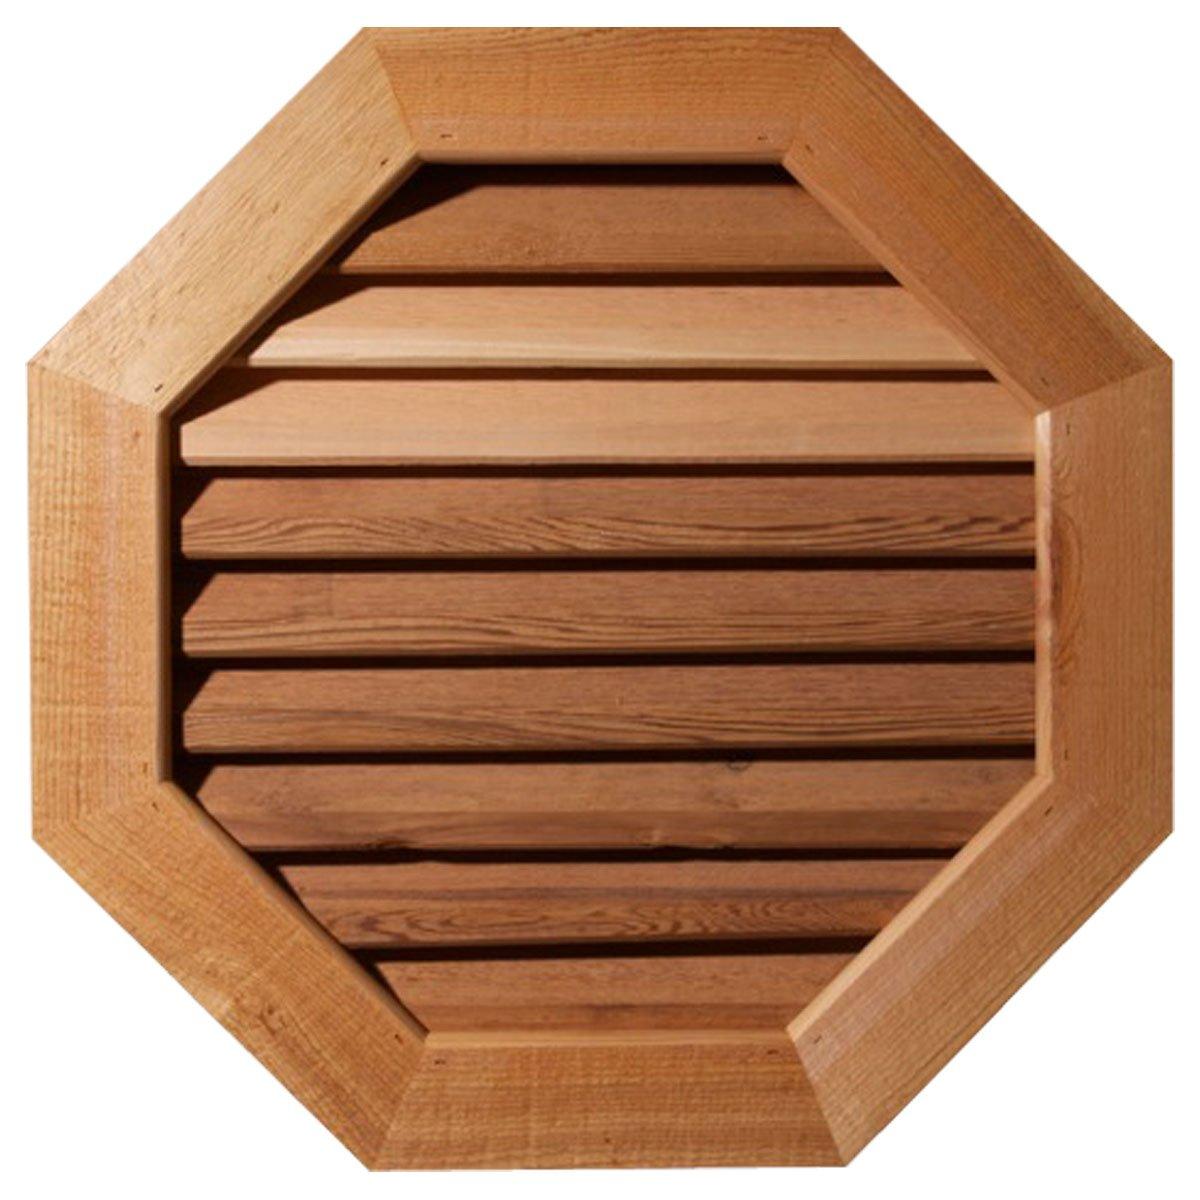 Ekena Millwork GVWOC24X2401SFUWR Unfinished, Functional, Smooth Western Red Cedar with 1-Inch x 4-Inch Flat Trim Octagonal Gable Vent 29-Inch x 29-Inch Frame Size, 24-Inch x 24-Inch